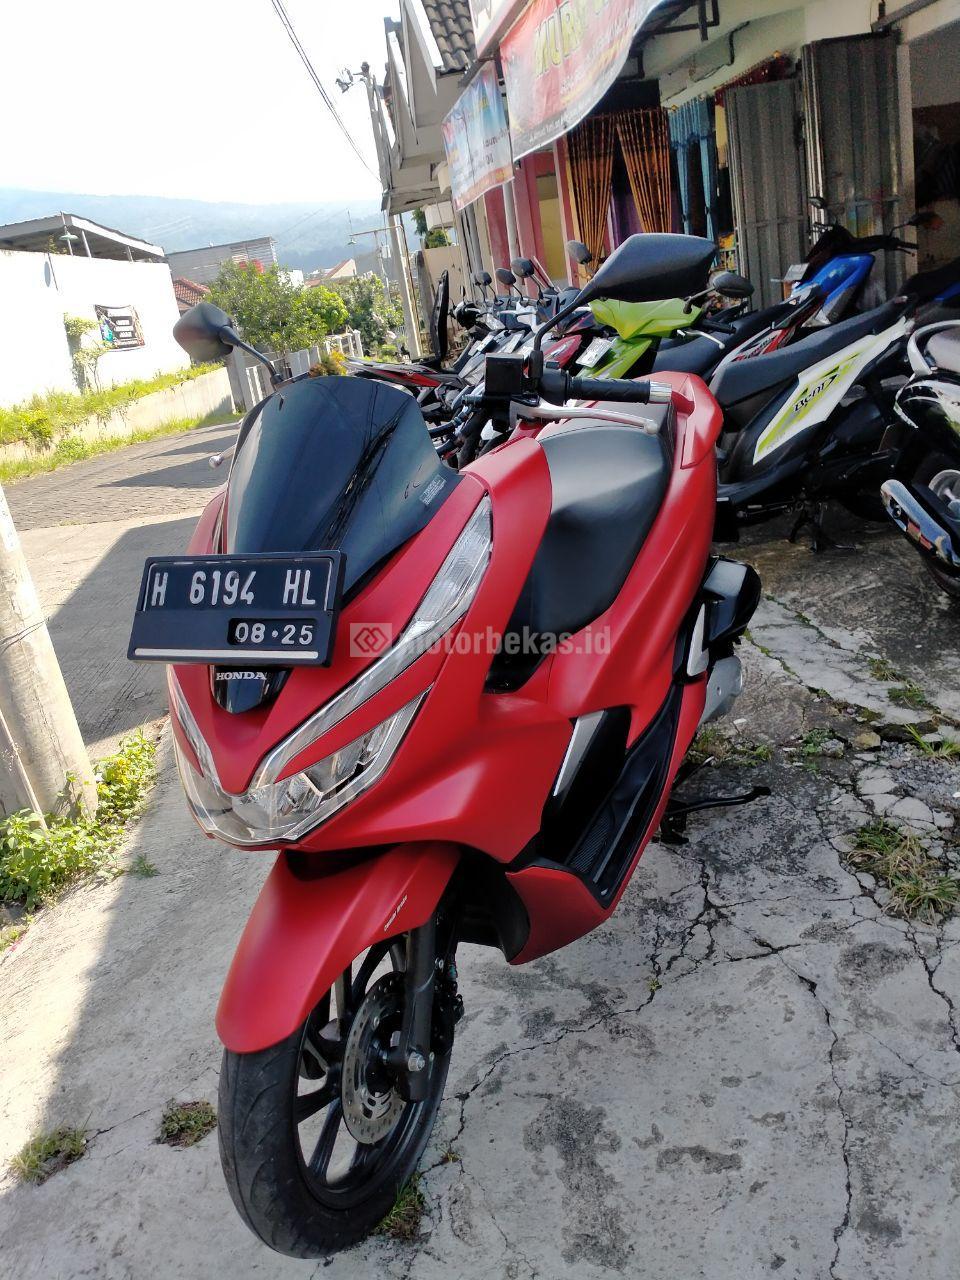 HONDA PCX  3017 motorbekas.id